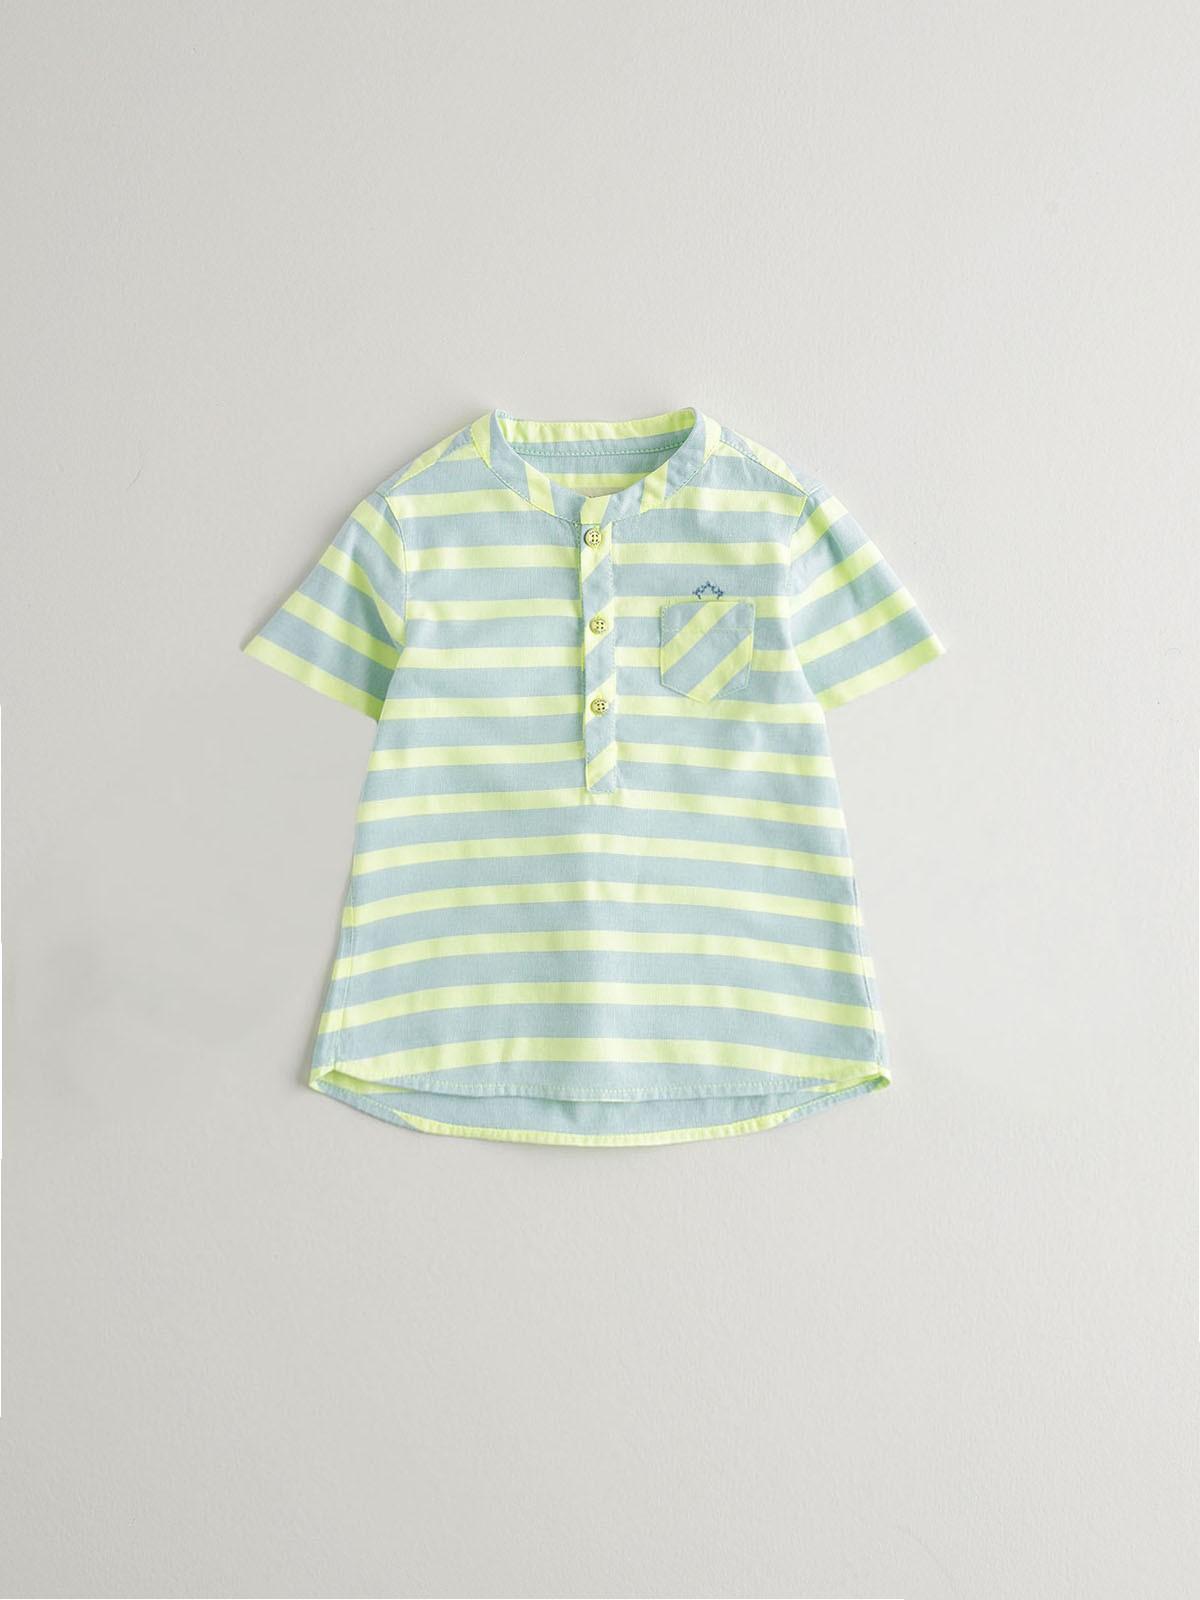 NANOS 淺藍條紋無領短袖襯衫-BOY